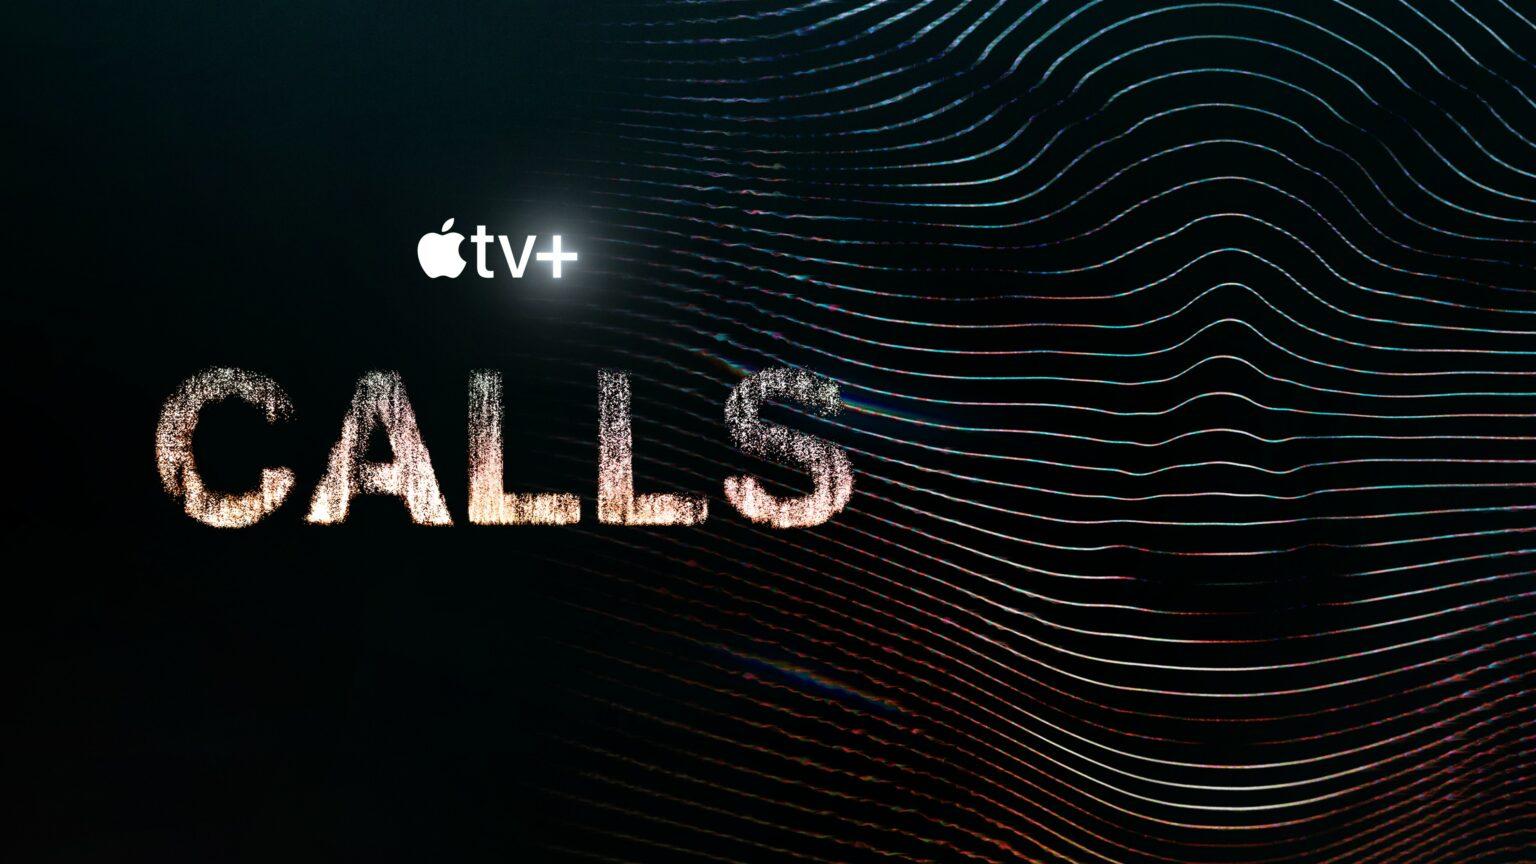 Calls on Apple TV+